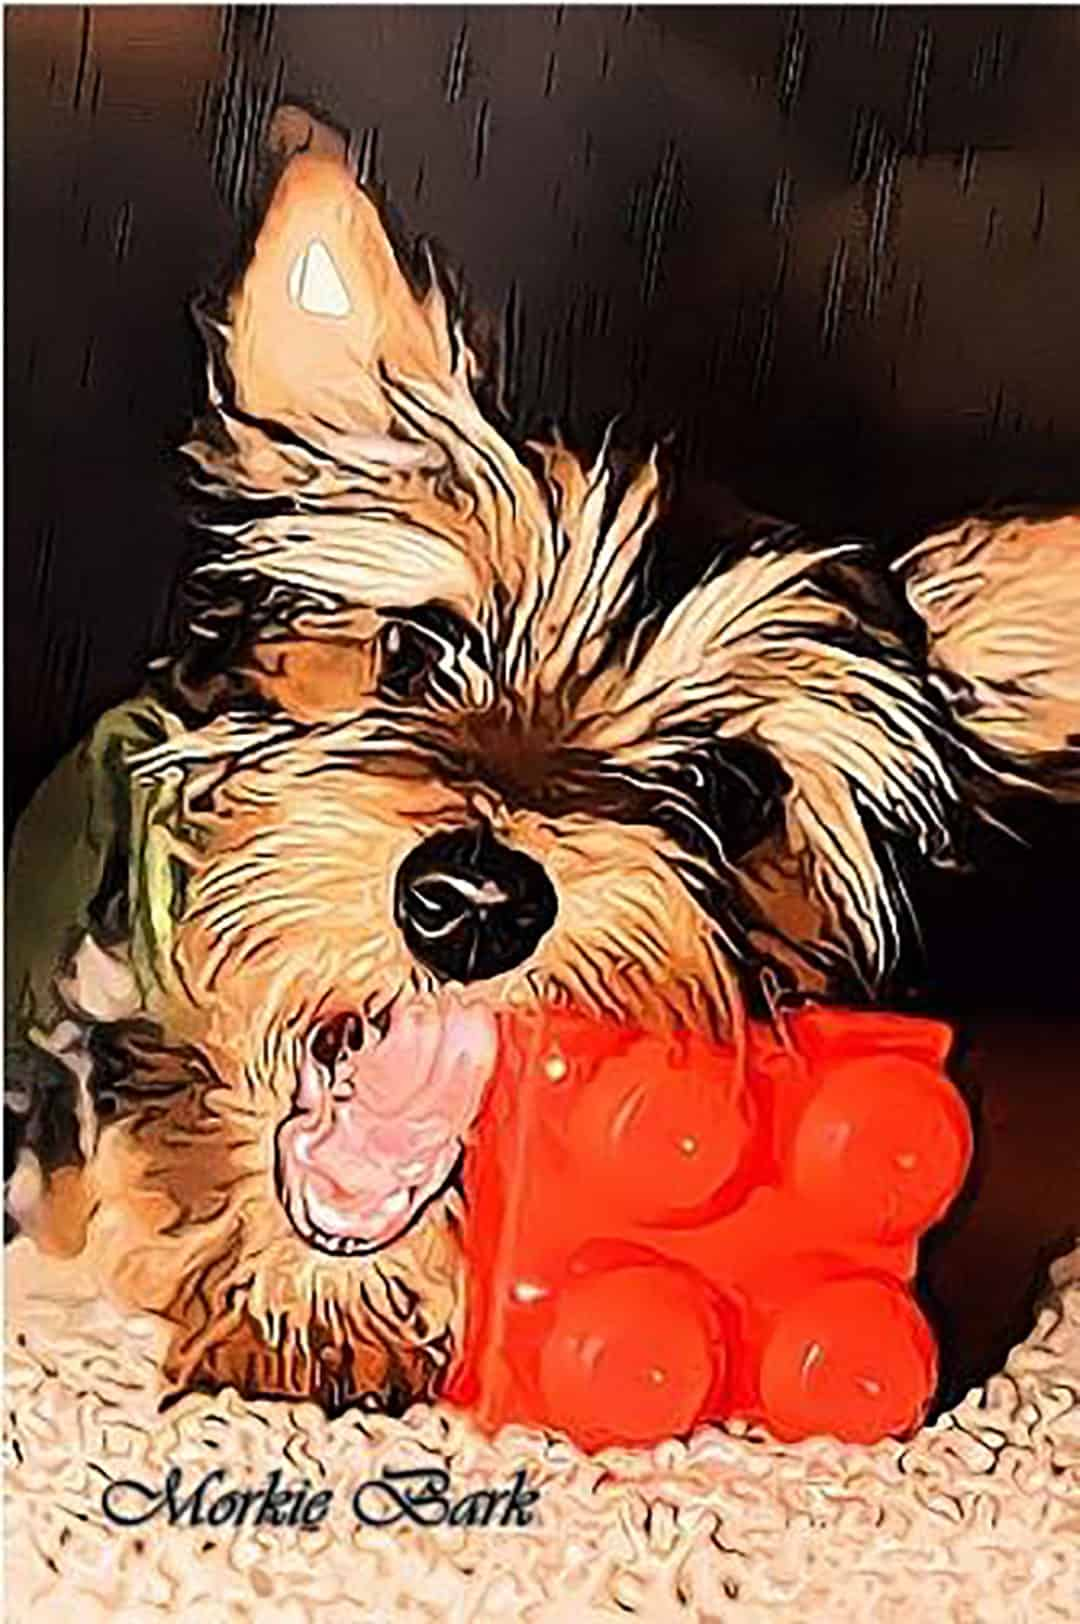 Morkie Barking, How to stop morkie barking, Morkie dog not to bark